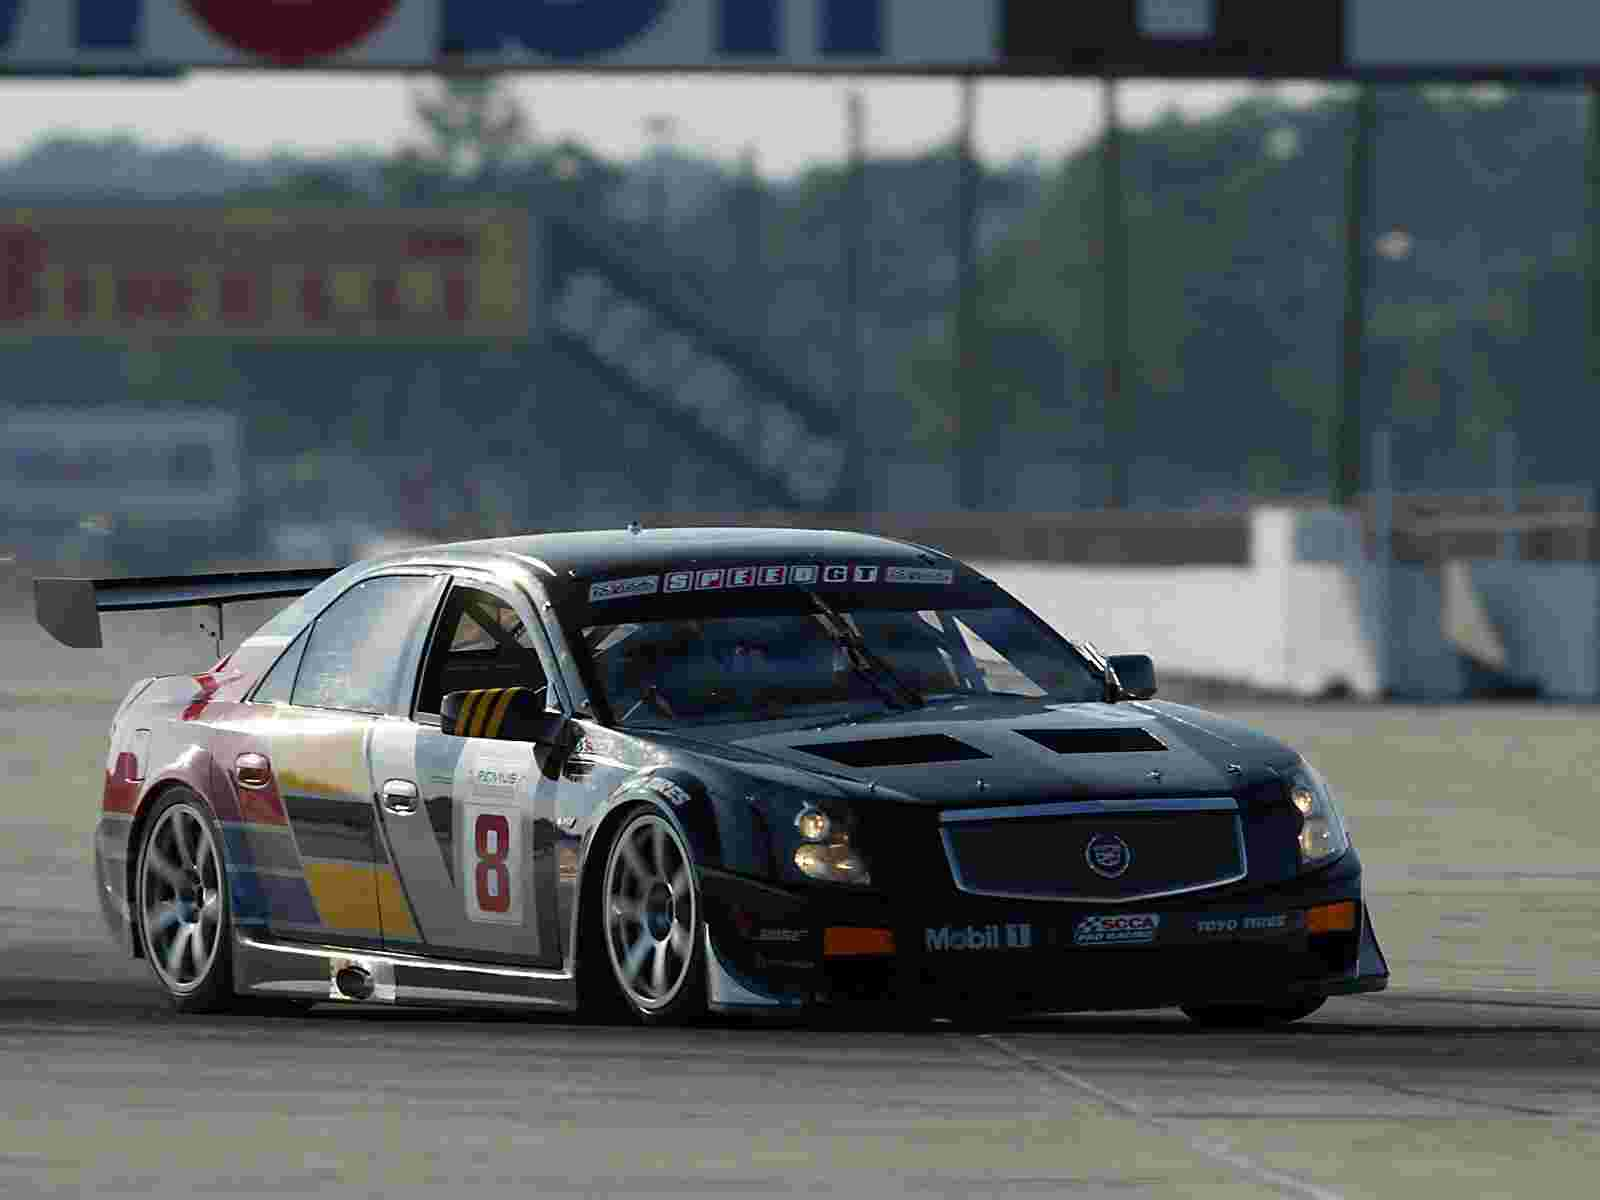 cadillac cts v race car 28643326 wallpaper   Cadillac   Auto Moto 1600x1200